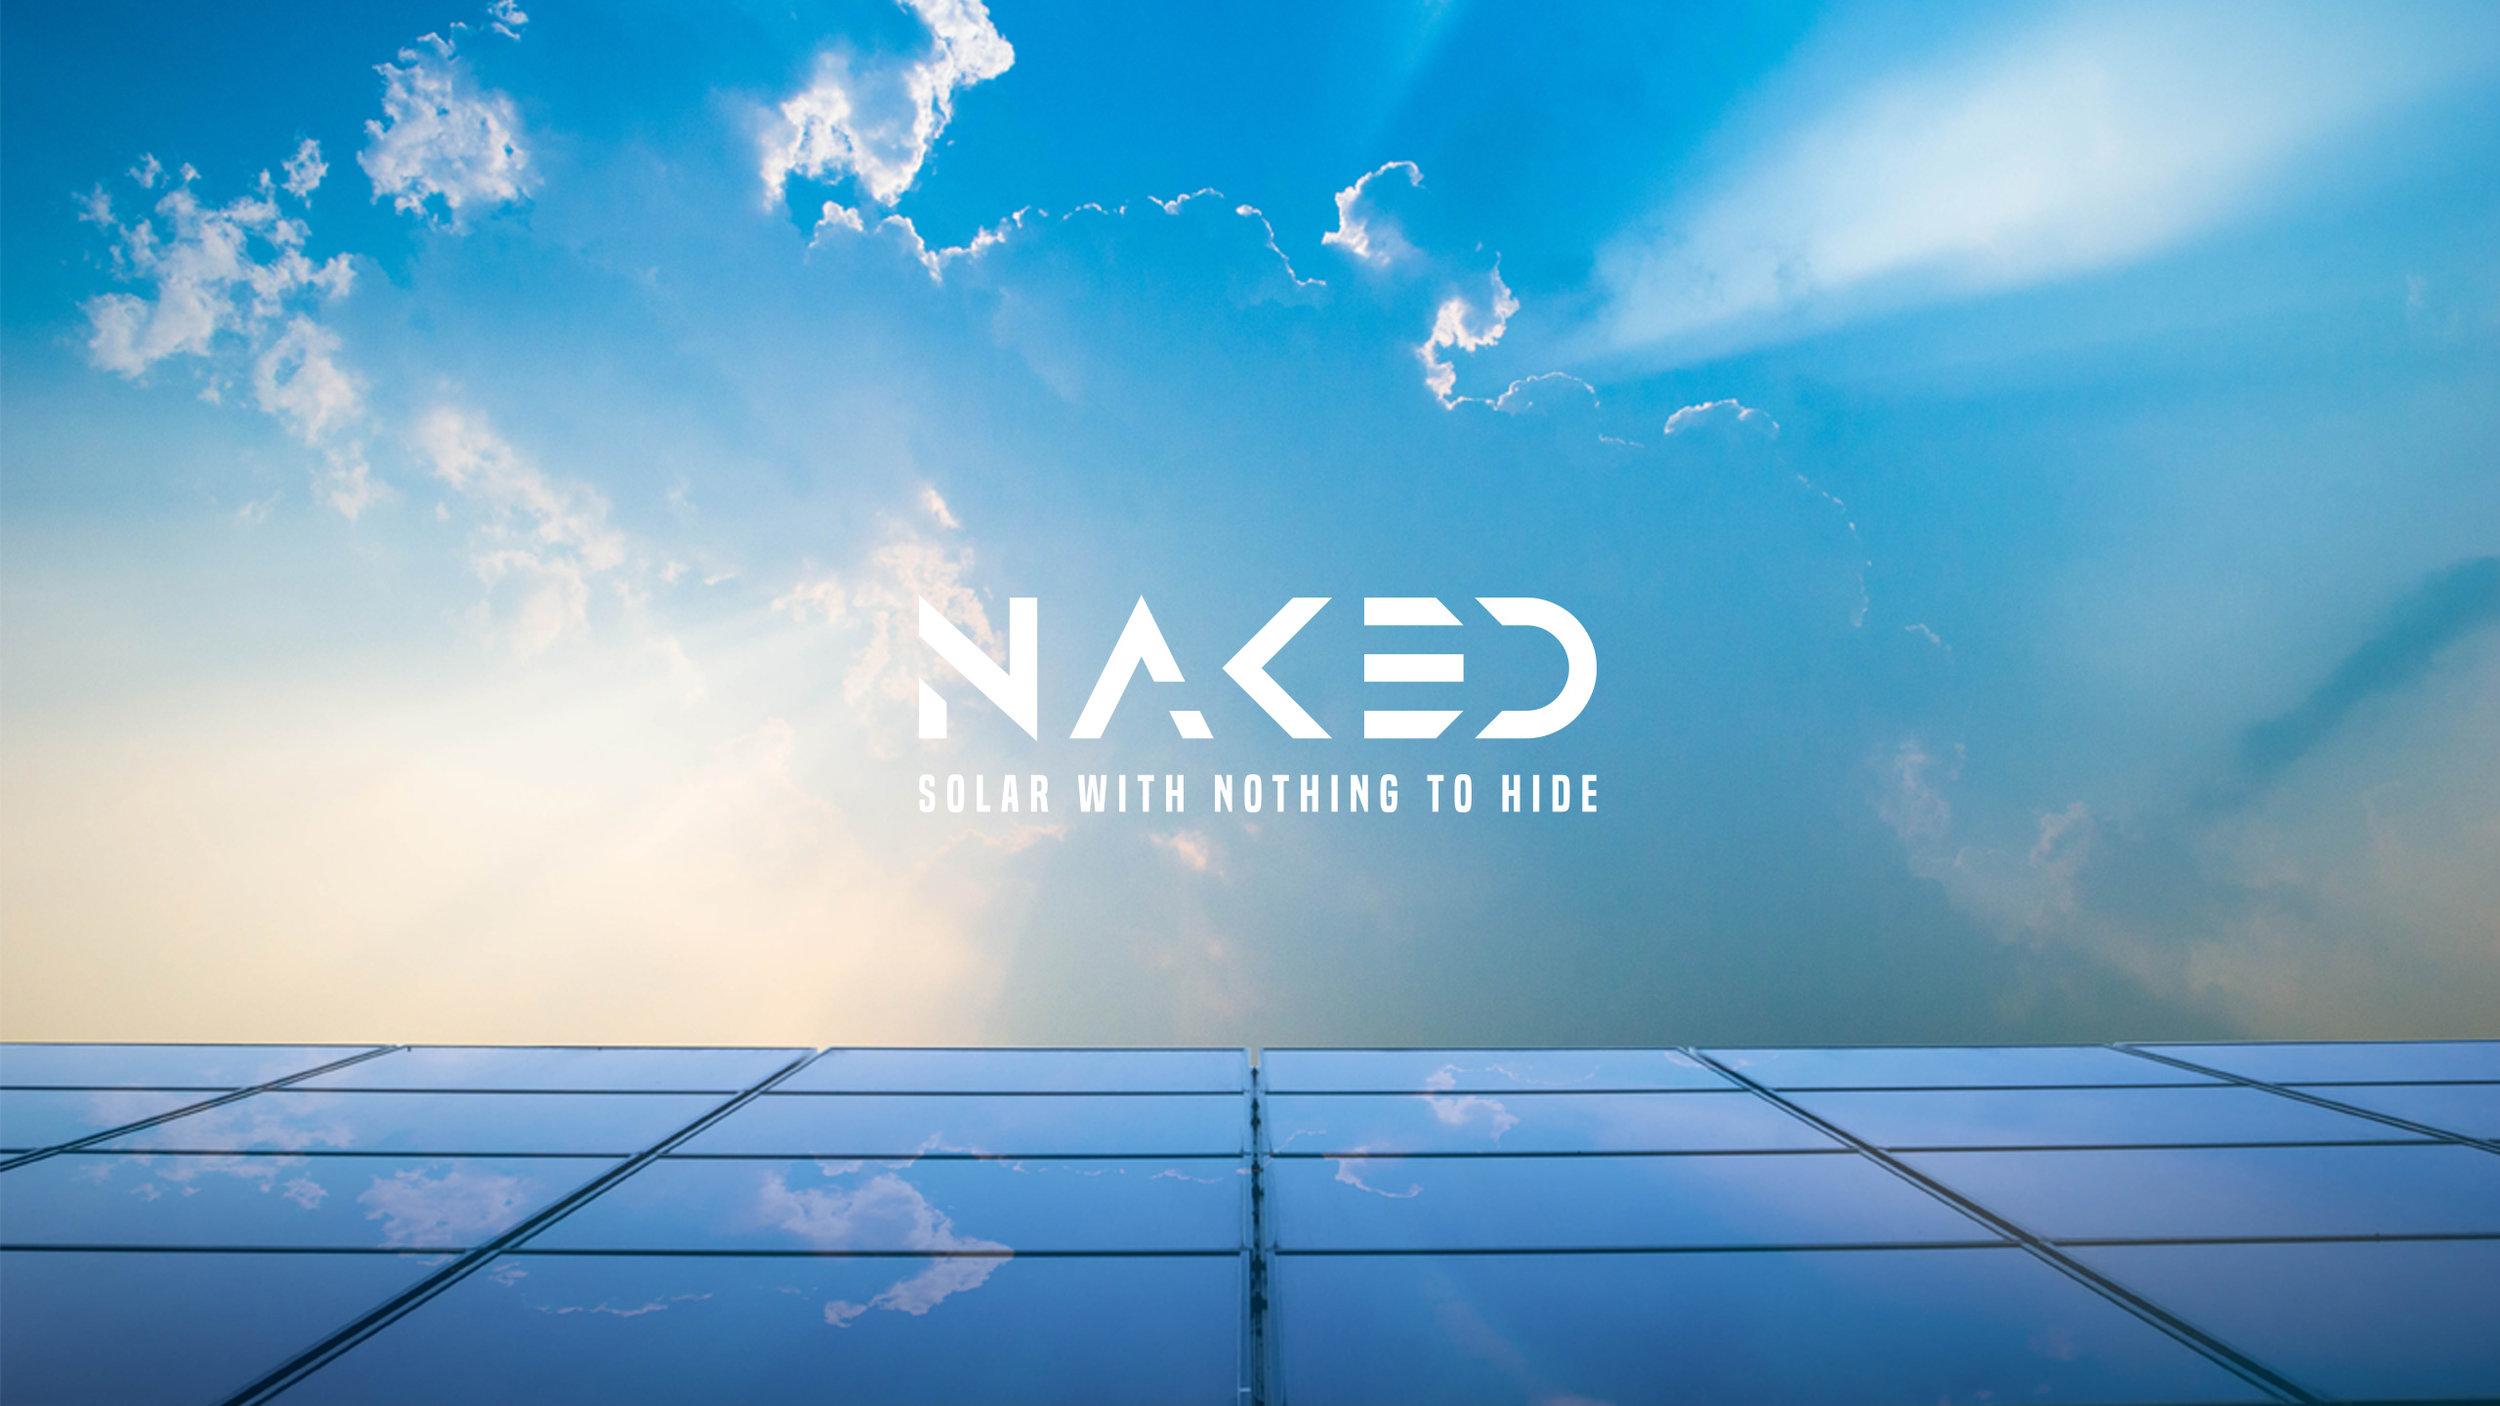 naked solar logo and brand image